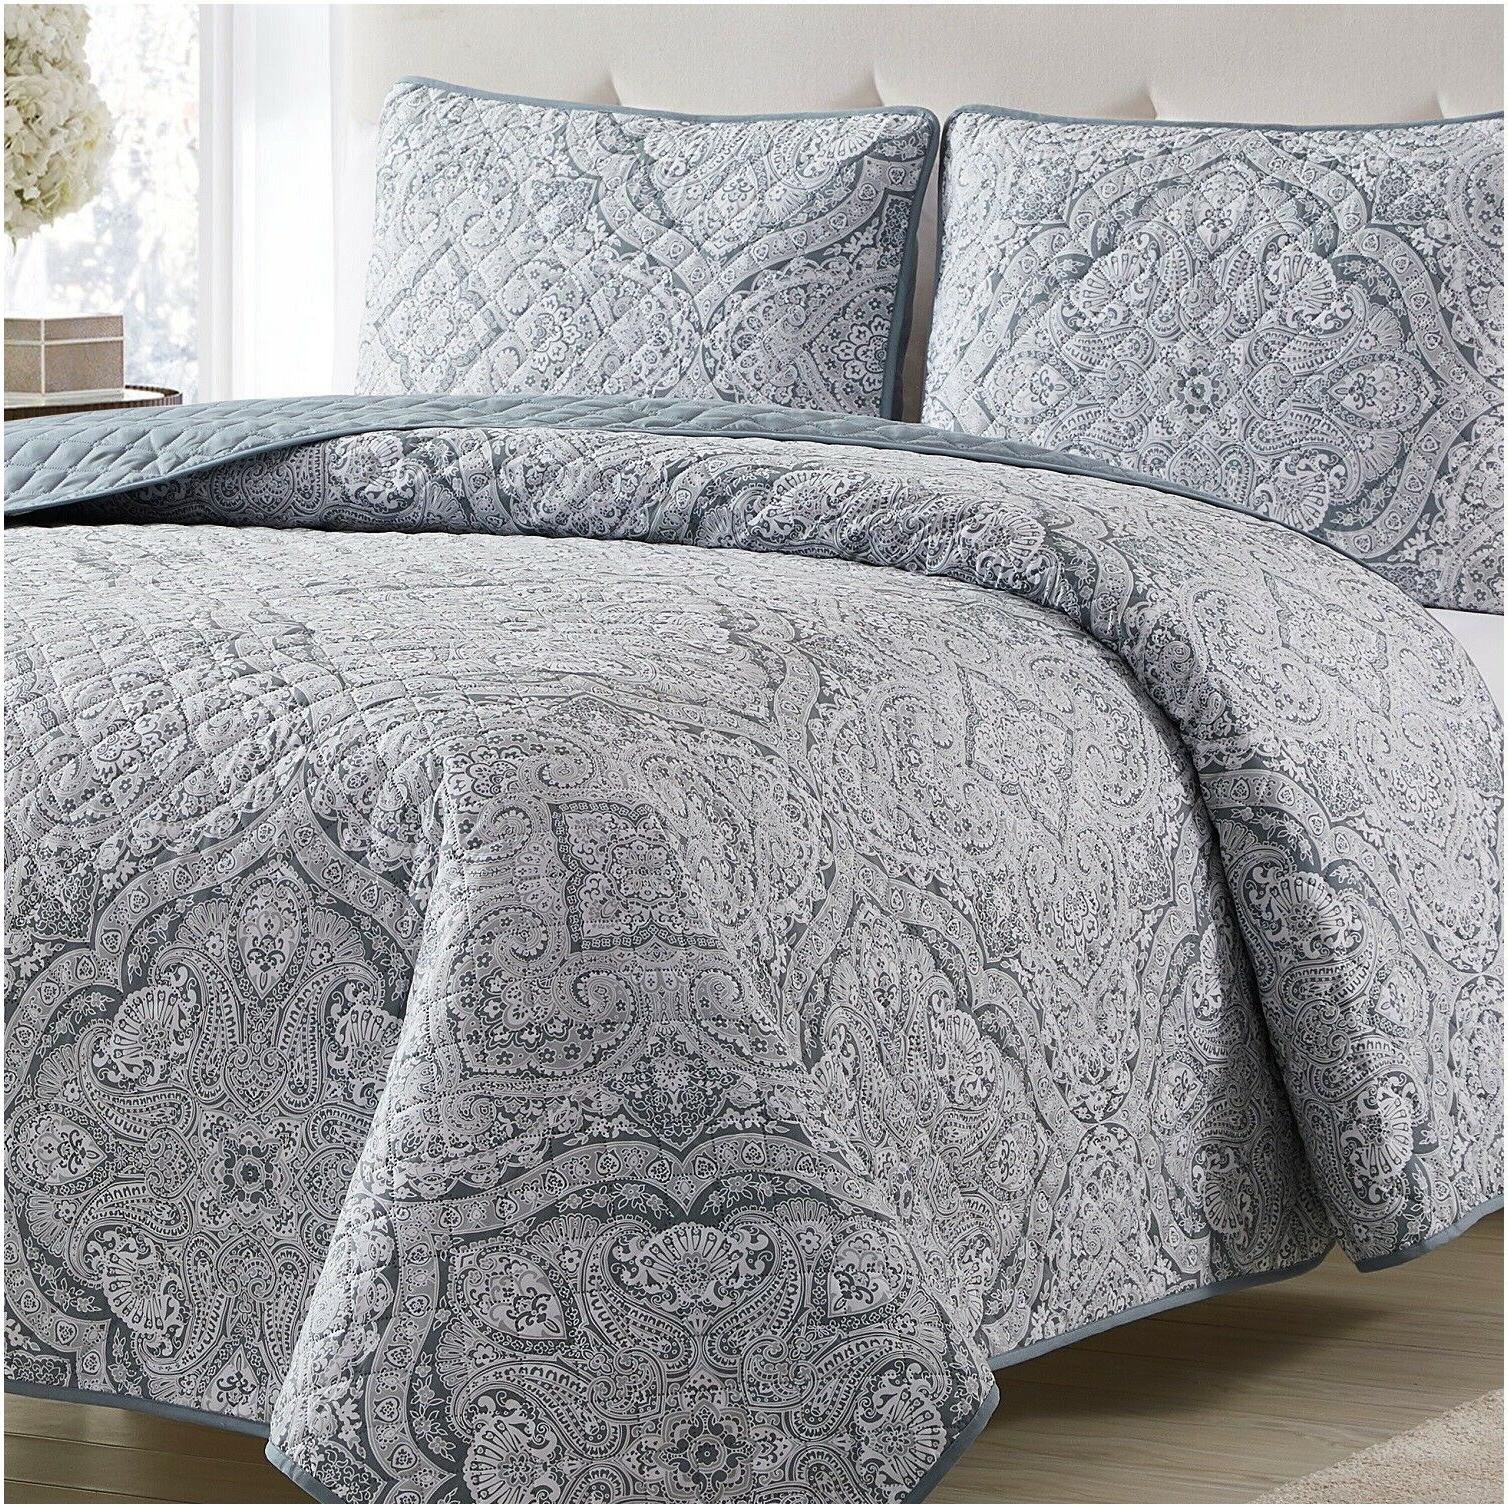 Mellanni Bedspread Coverlet Set 3 Piece Medallion Quilt Set Oversized Bed Cover